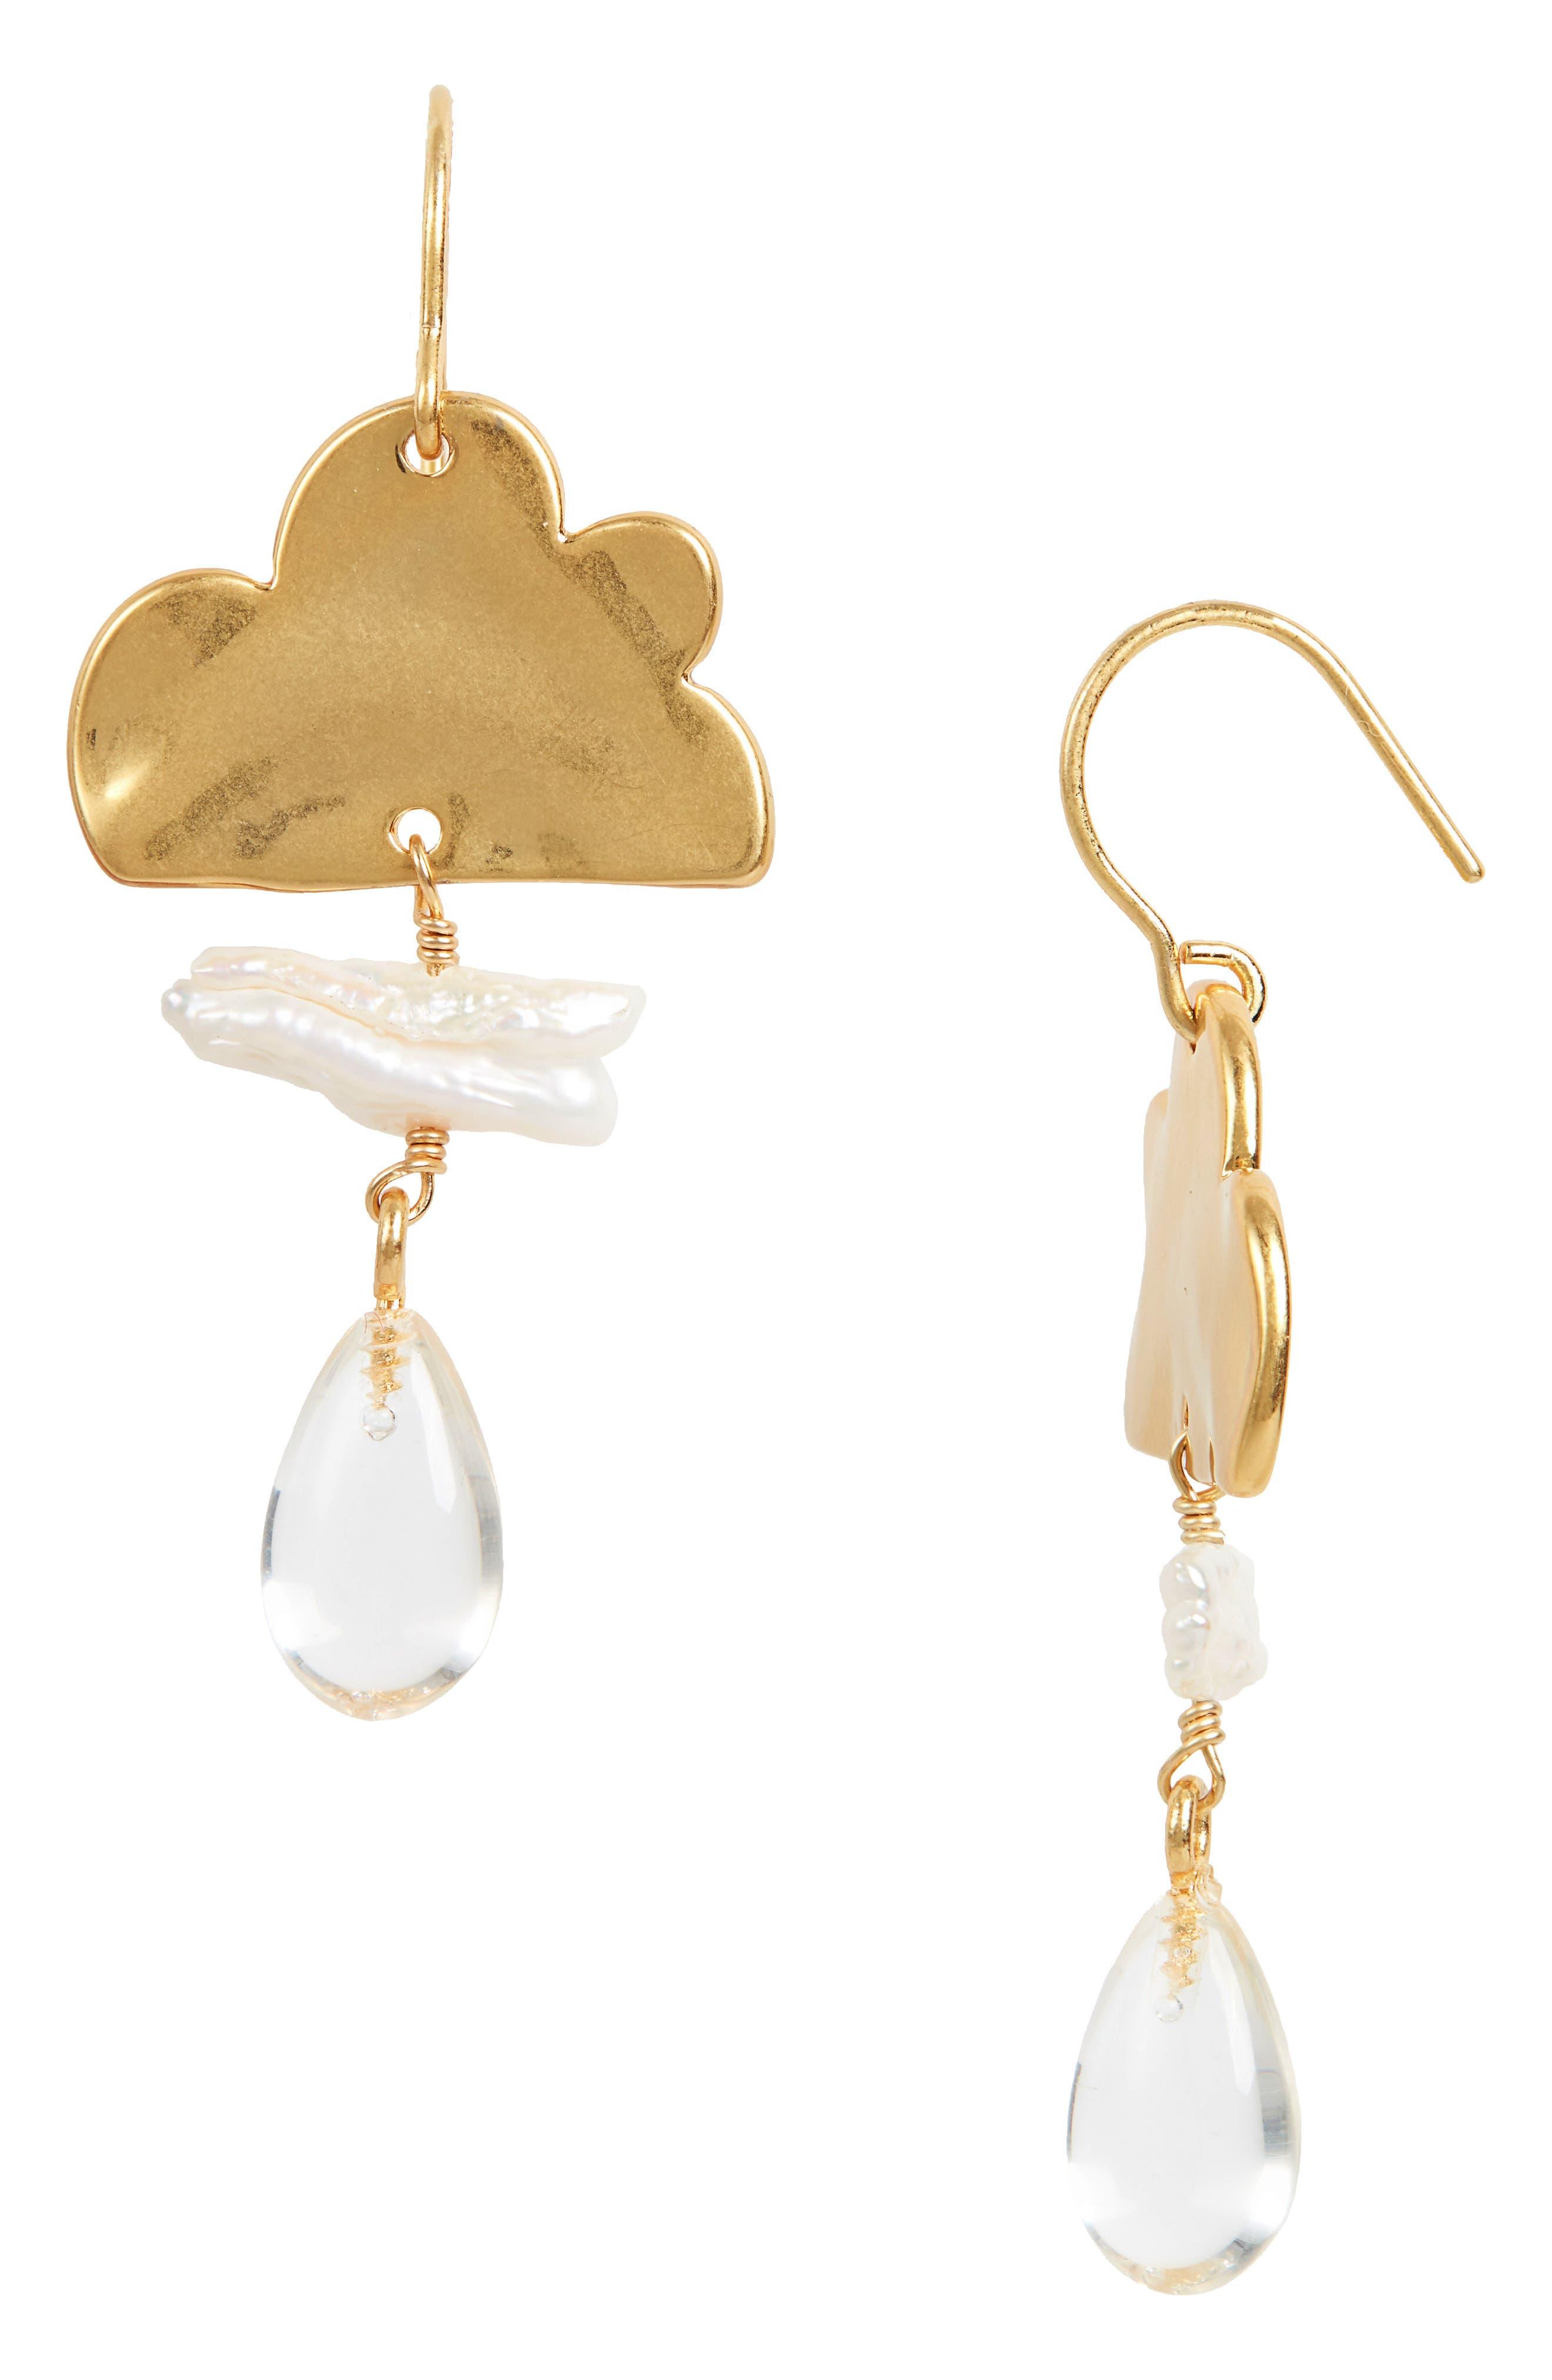 SALE Glitter Resin Necklace /& Earring Set In Antiqued Brass